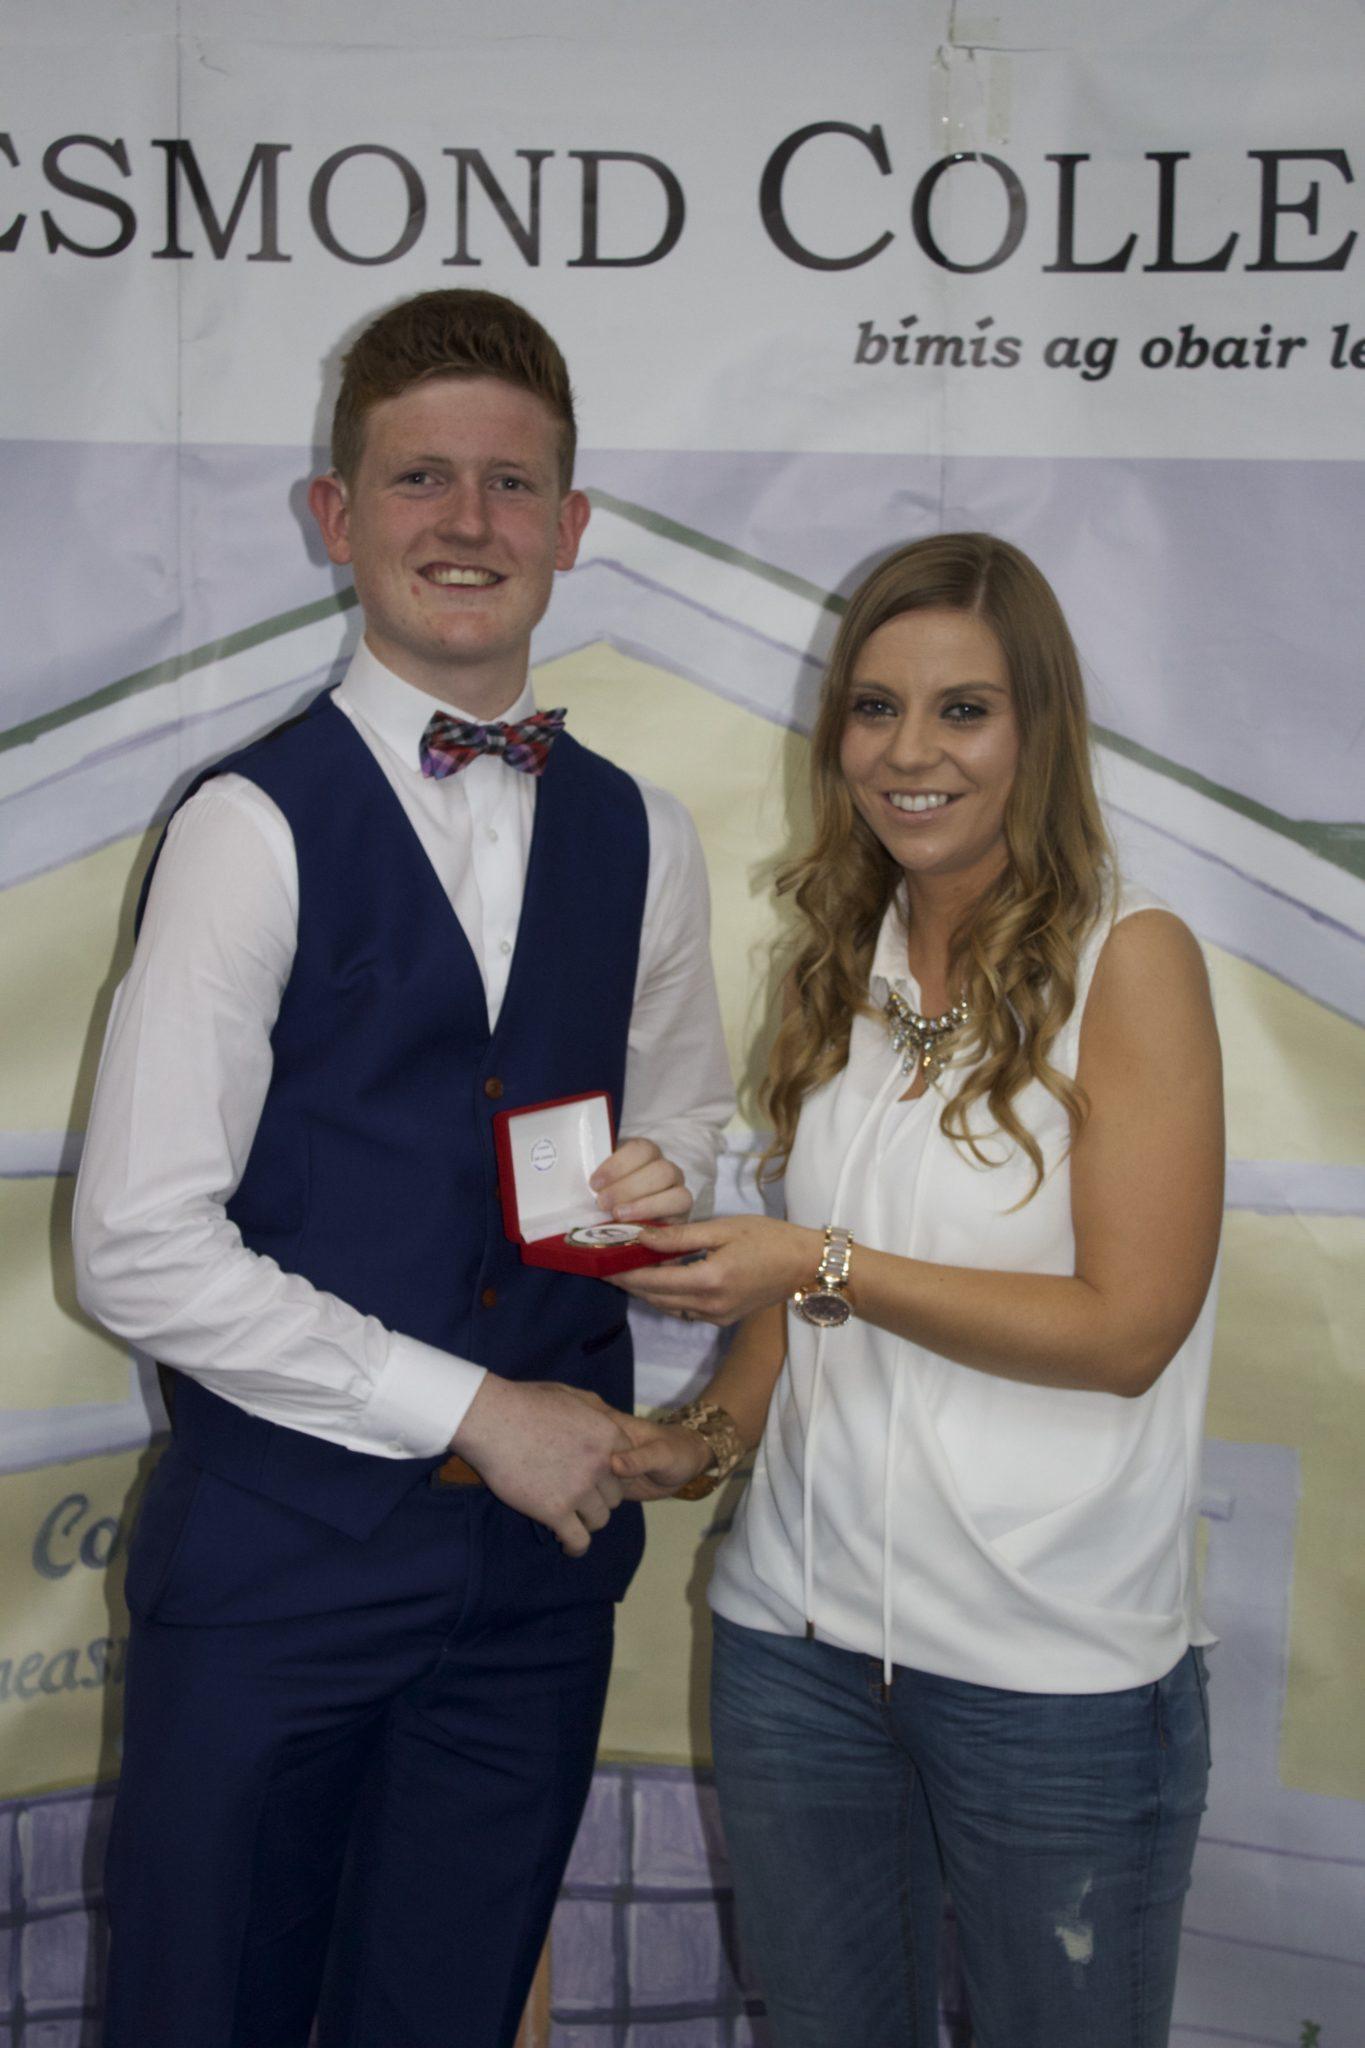 Desmond College Leaving Certificate Graduation 2015 : Sports Awards: Evan Larkin with Ms Corkery